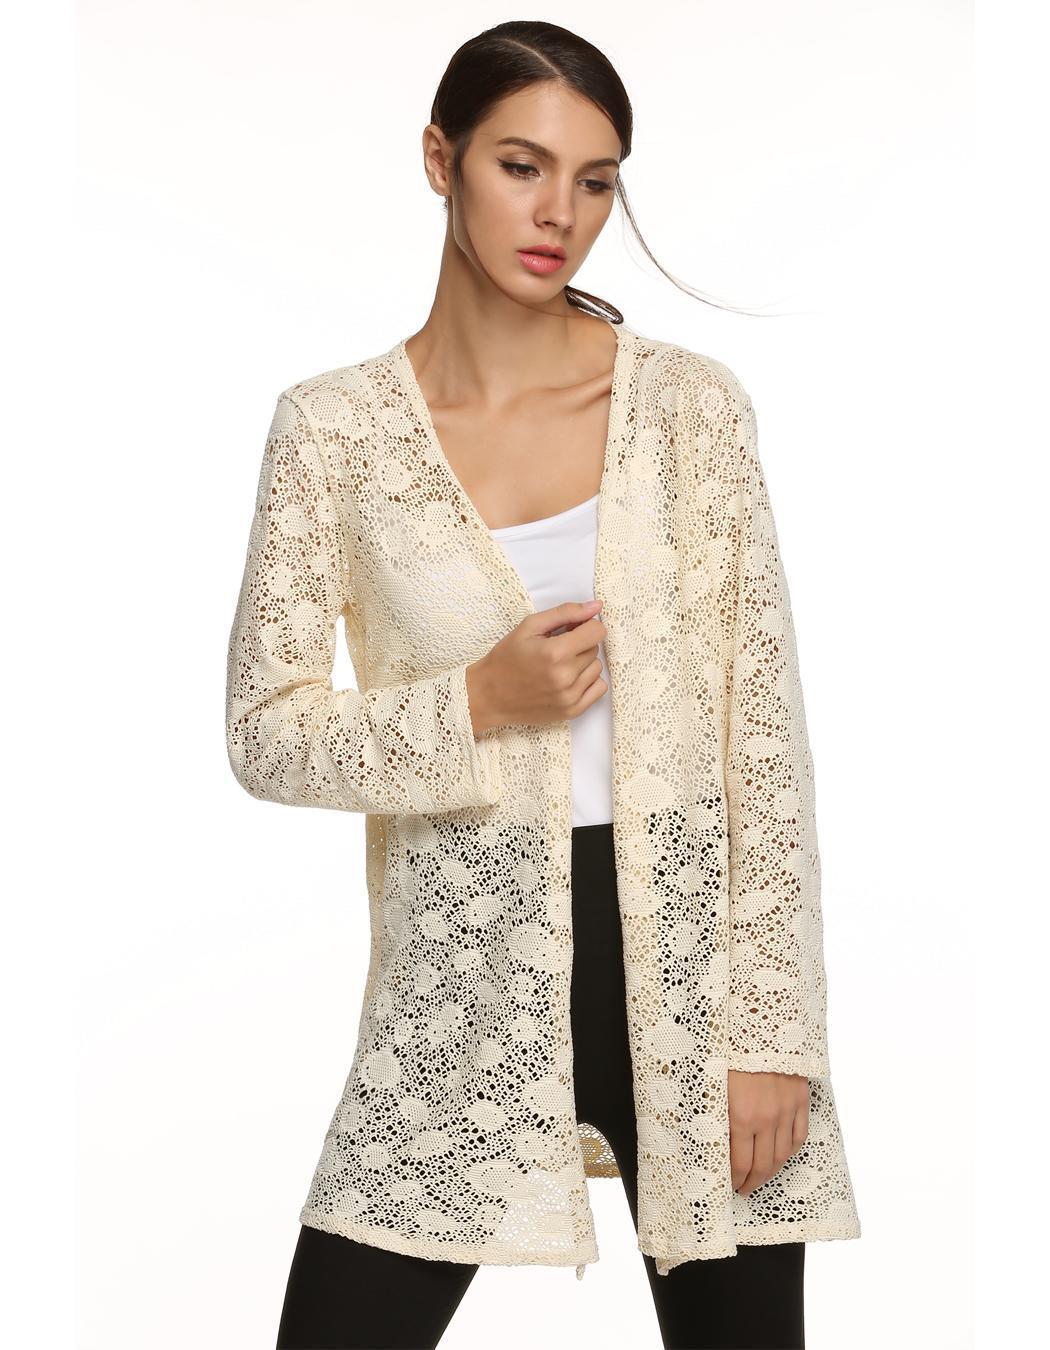 Women Long Sleeve Hollow Out Crochet Long Cardigan Tops 2